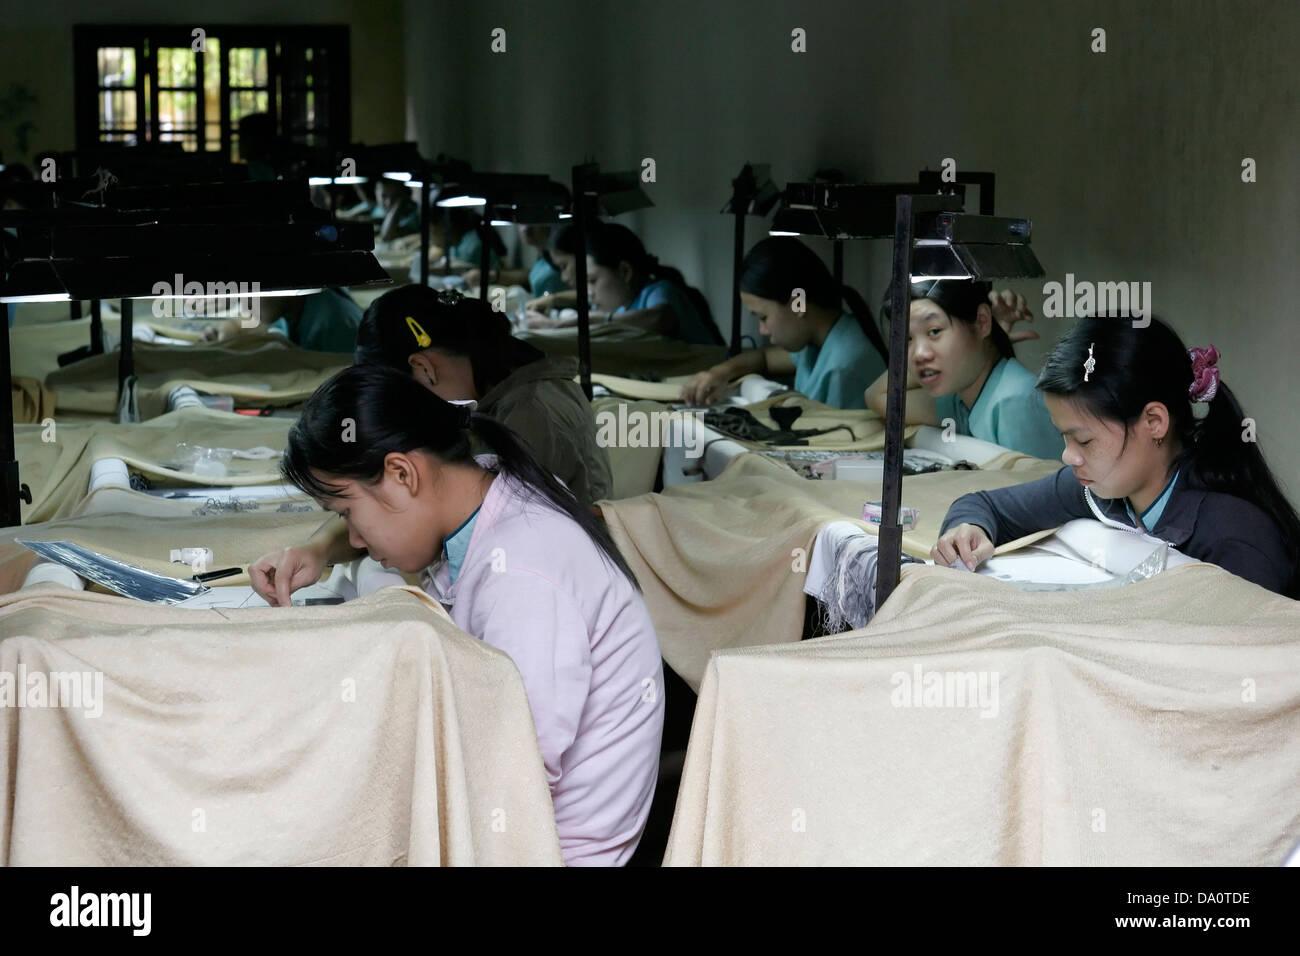 young women working at sewing factory making tedious handmade items, Hanoi, Vietnam Stock Photo